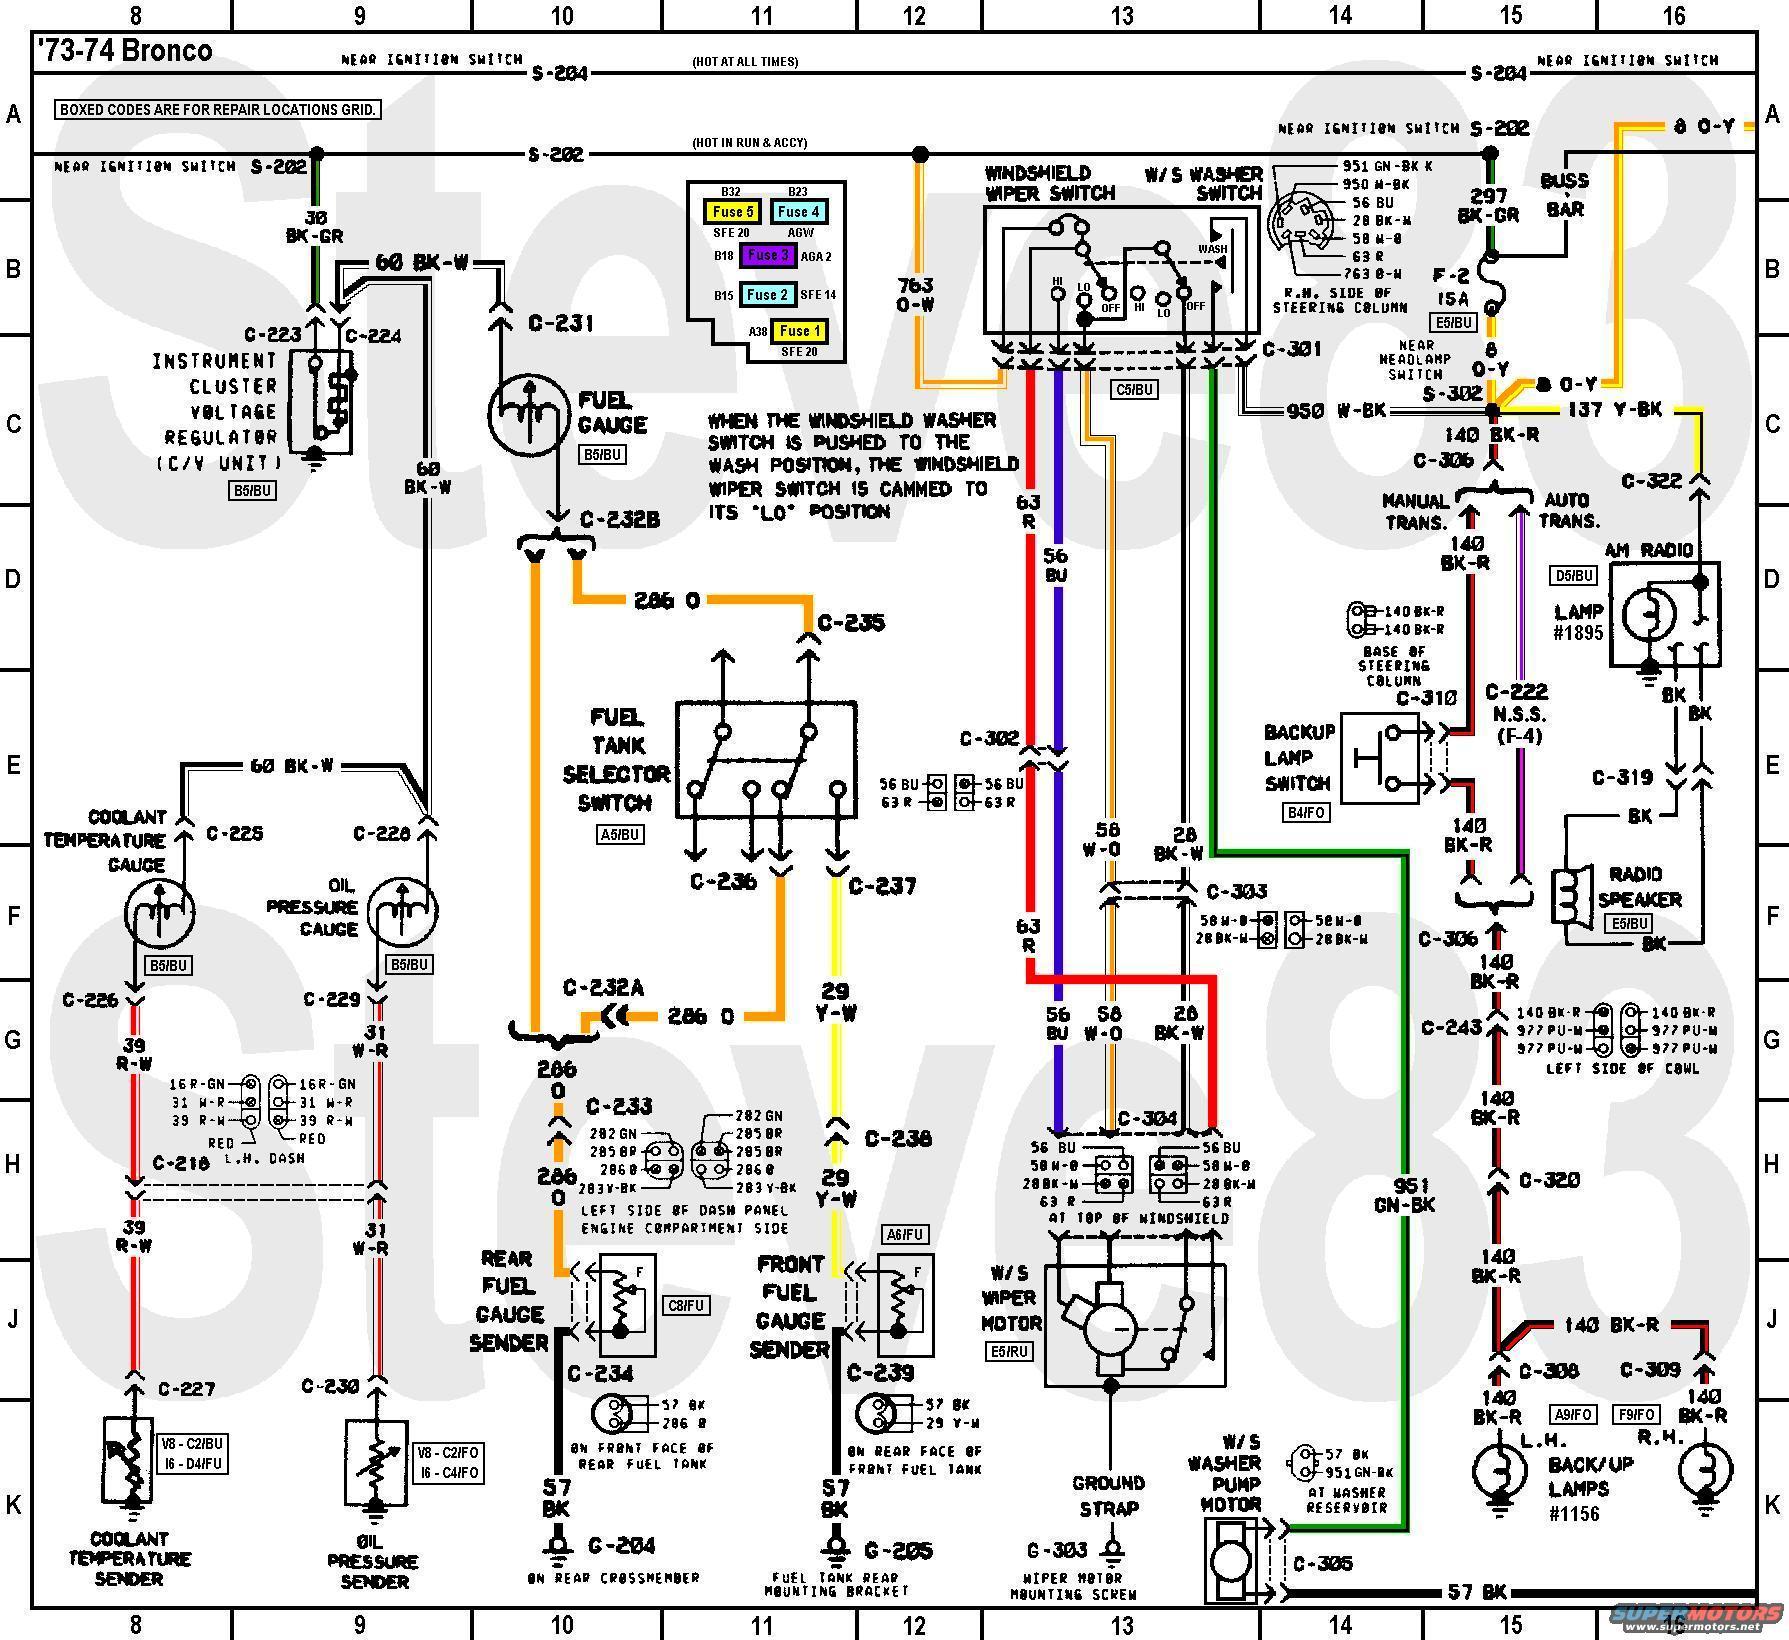 mitsubishi triton wiring diagram ford ignition coil outlander fuse box library th id oip 0auwjcsg9au8uq v igmgefdv pid 15 1 1990 radio 2006 eclipse